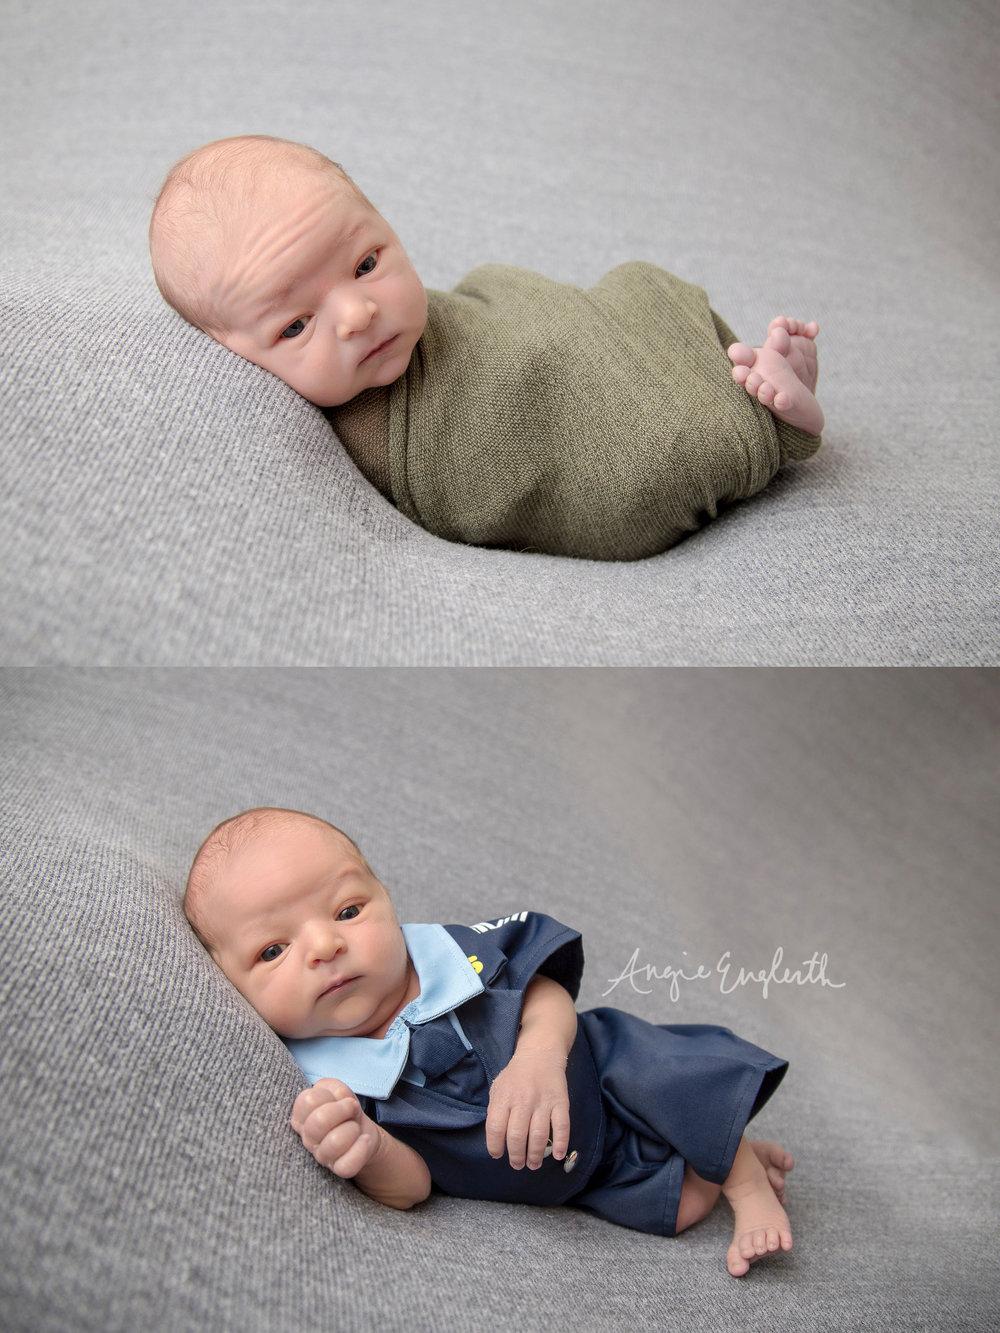 Lancaster_Newborn_Photographer_Angie_Englerth_awakebabies_003.jpg